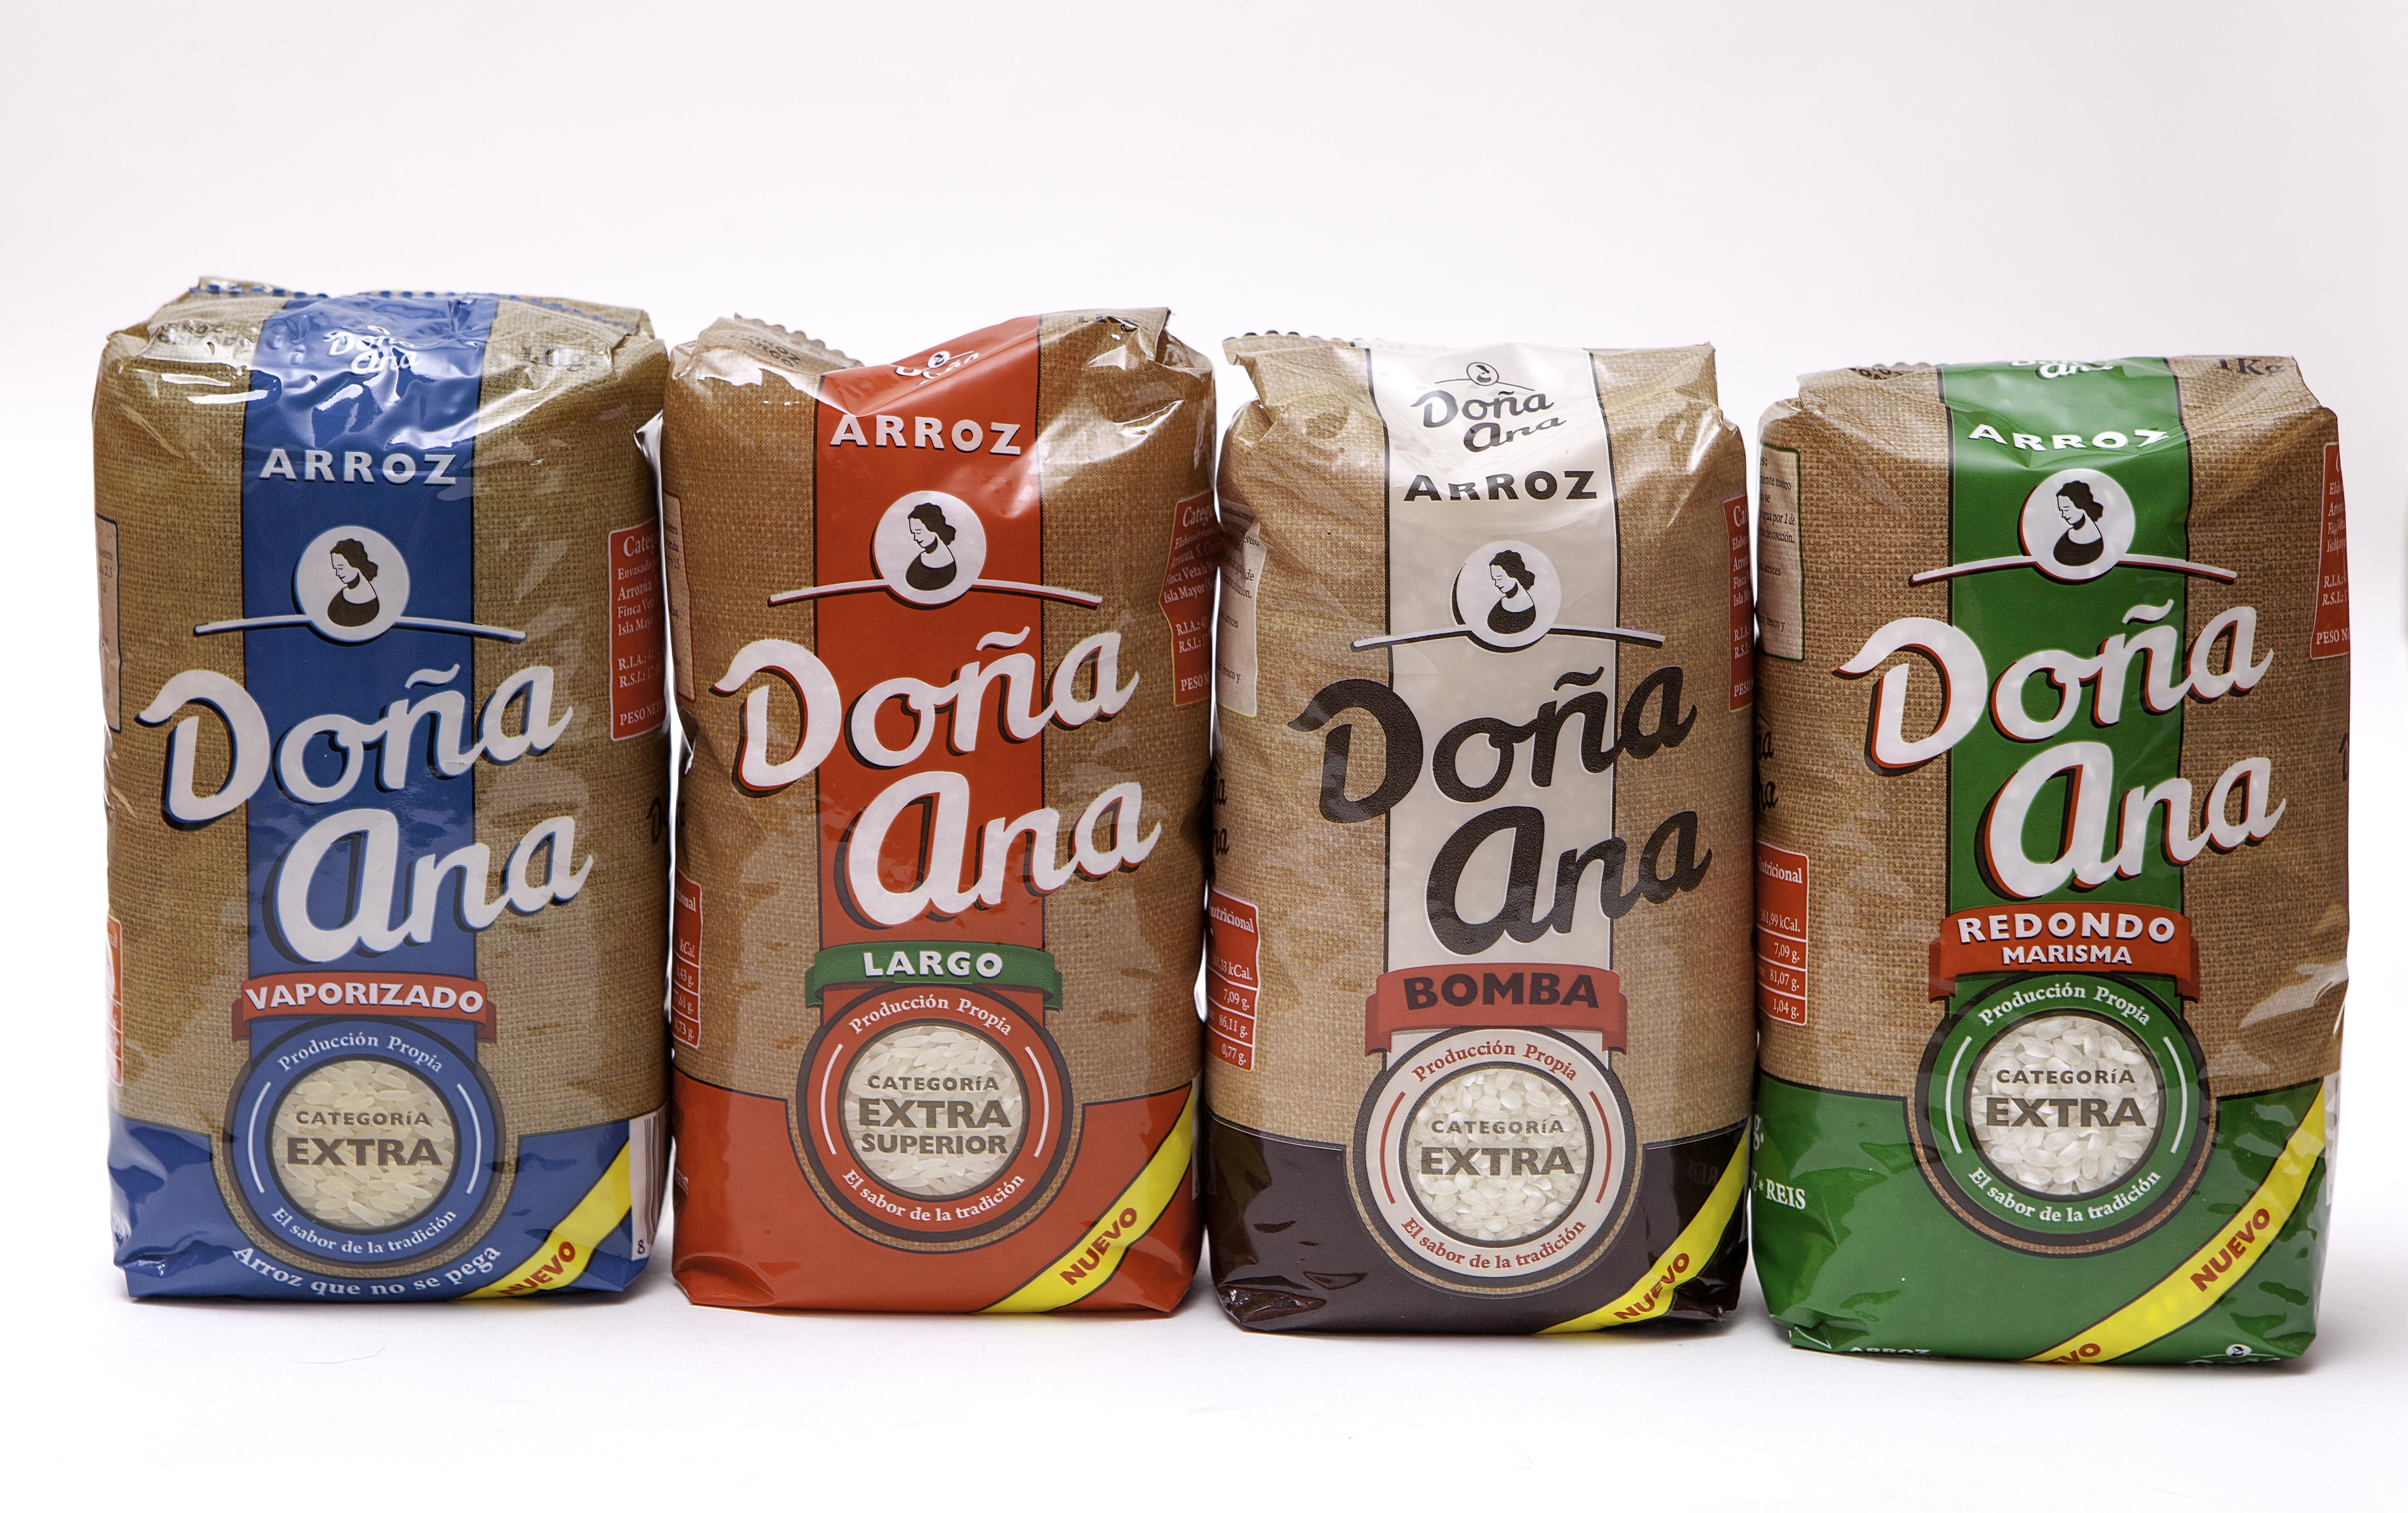 marca-donaaana-productos-arrozua-arroz-1kg